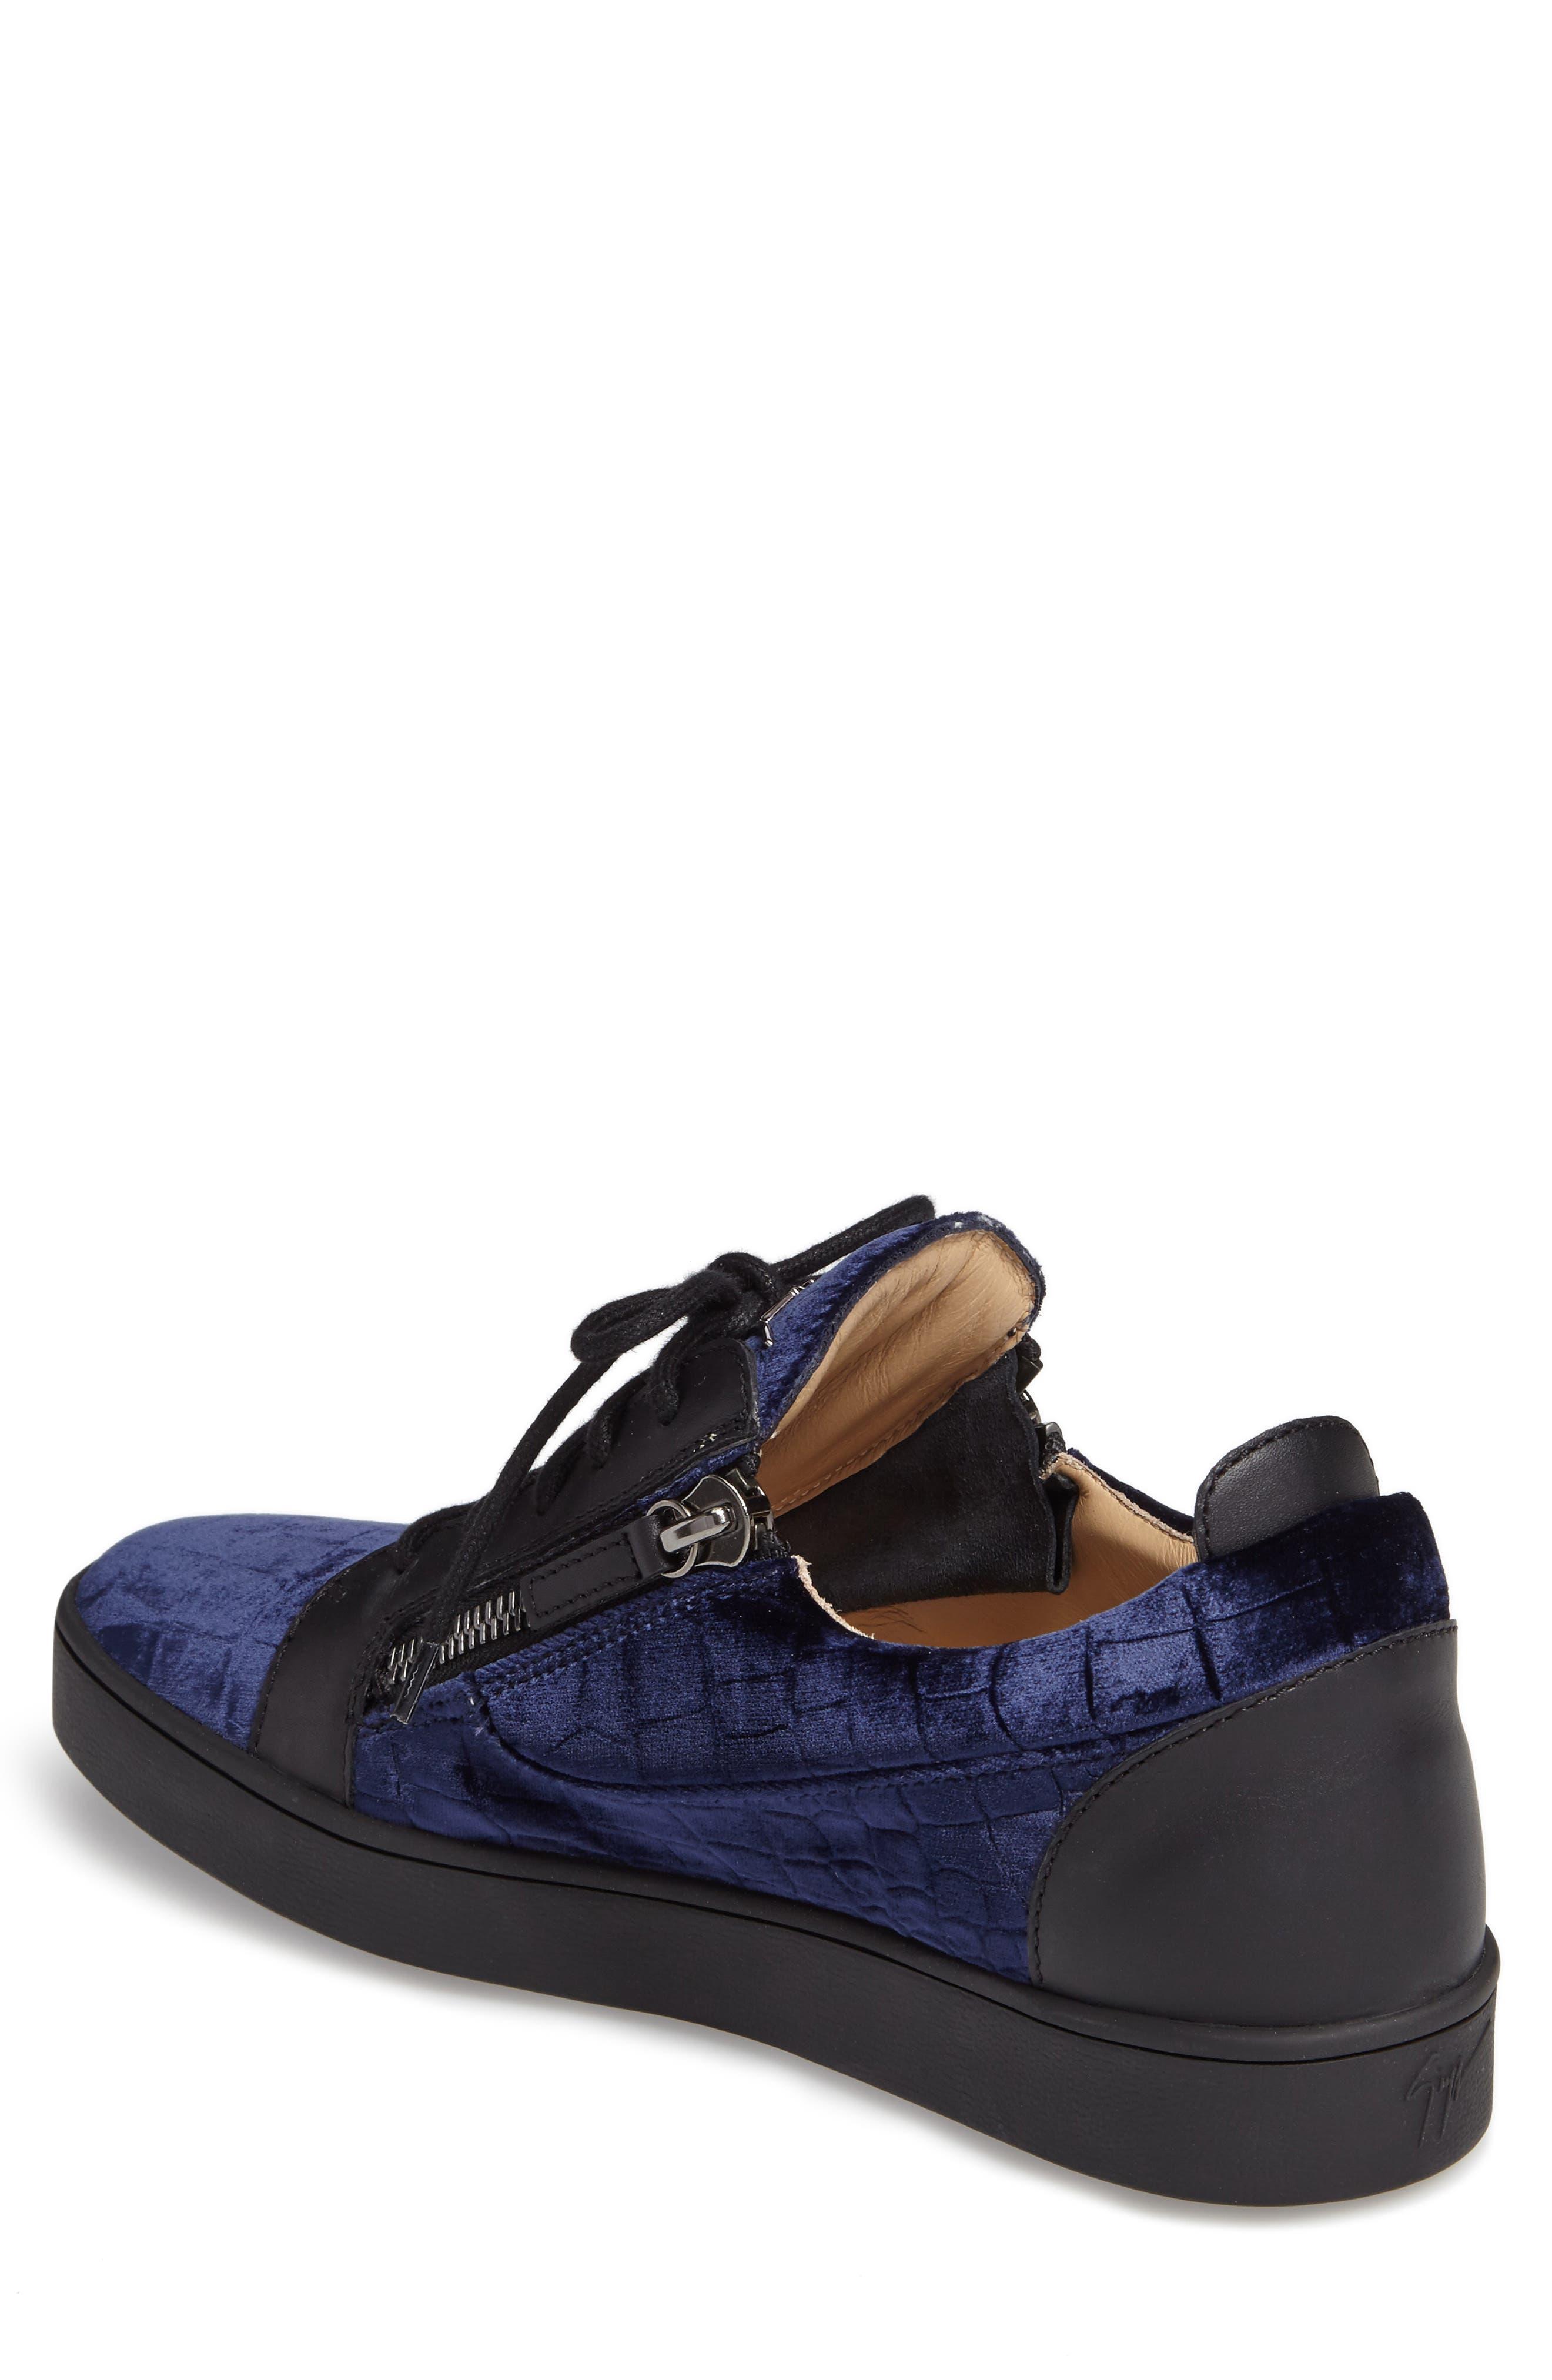 Low Top Sneaker,                             Alternate thumbnail 2, color,                             Navy